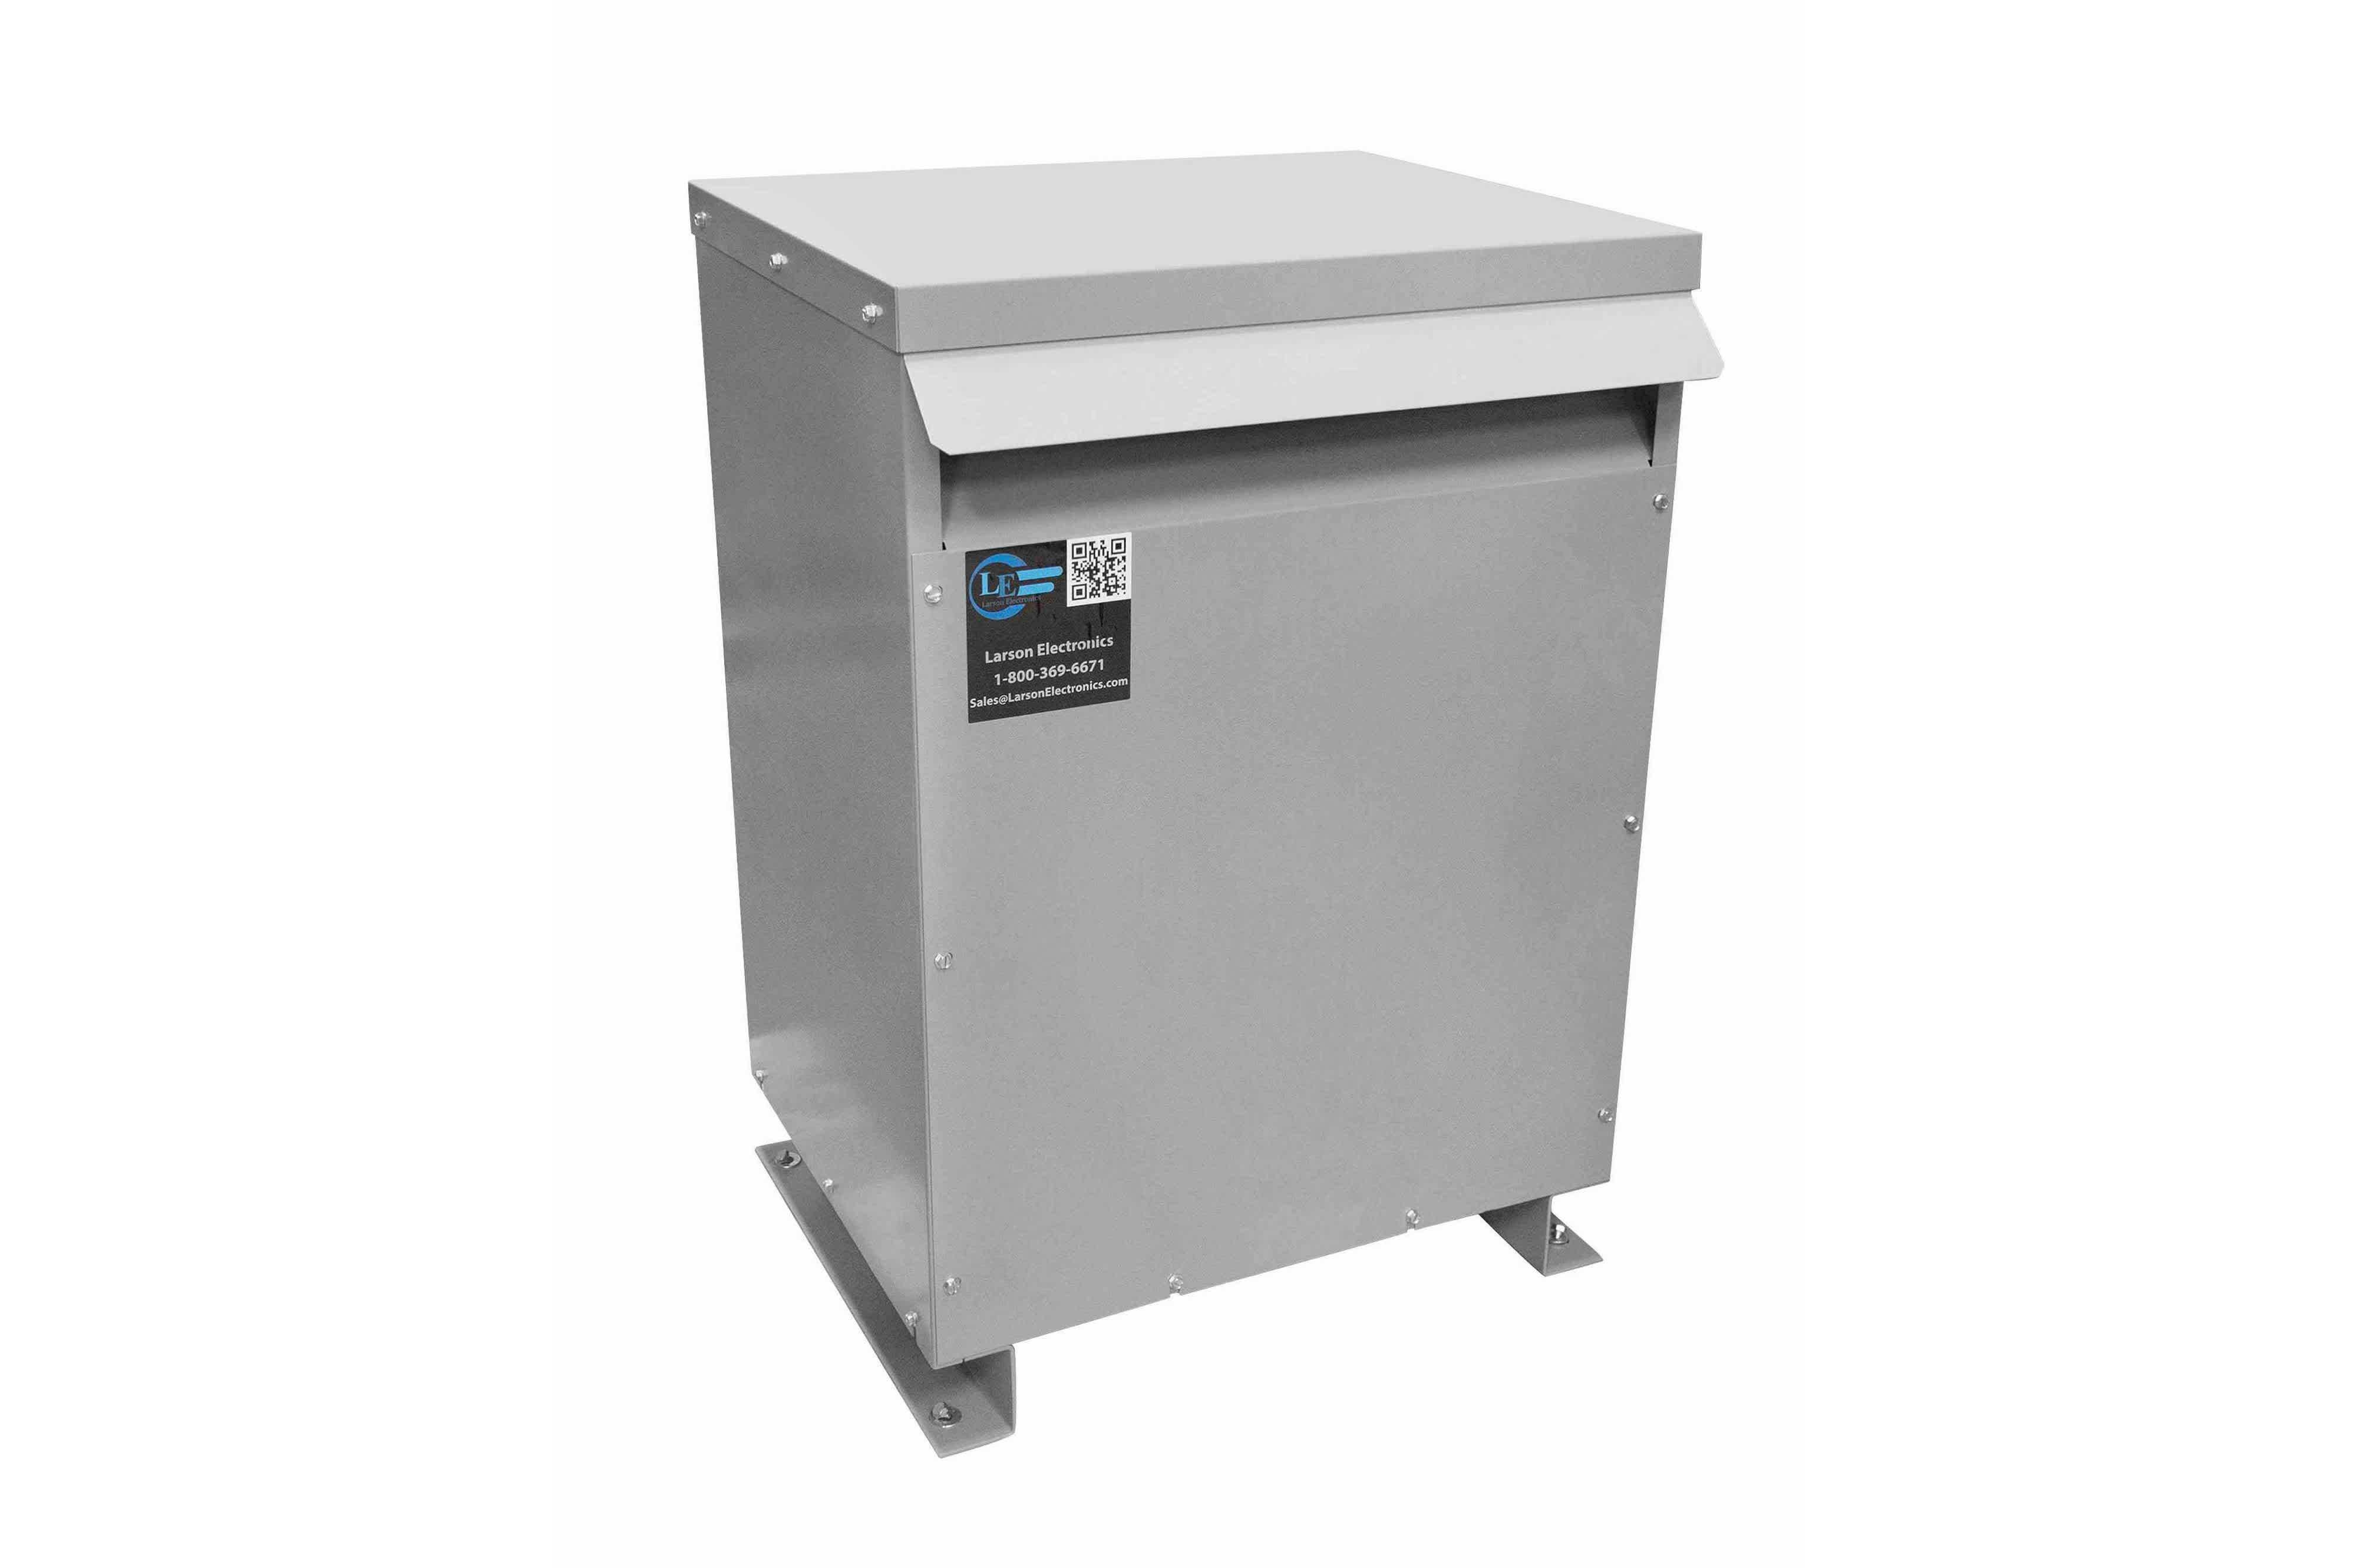 900 kVA 3PH Isolation Transformer, 208V Wye Primary, 380V Delta Secondary, N3R, Ventilated, 60 Hz